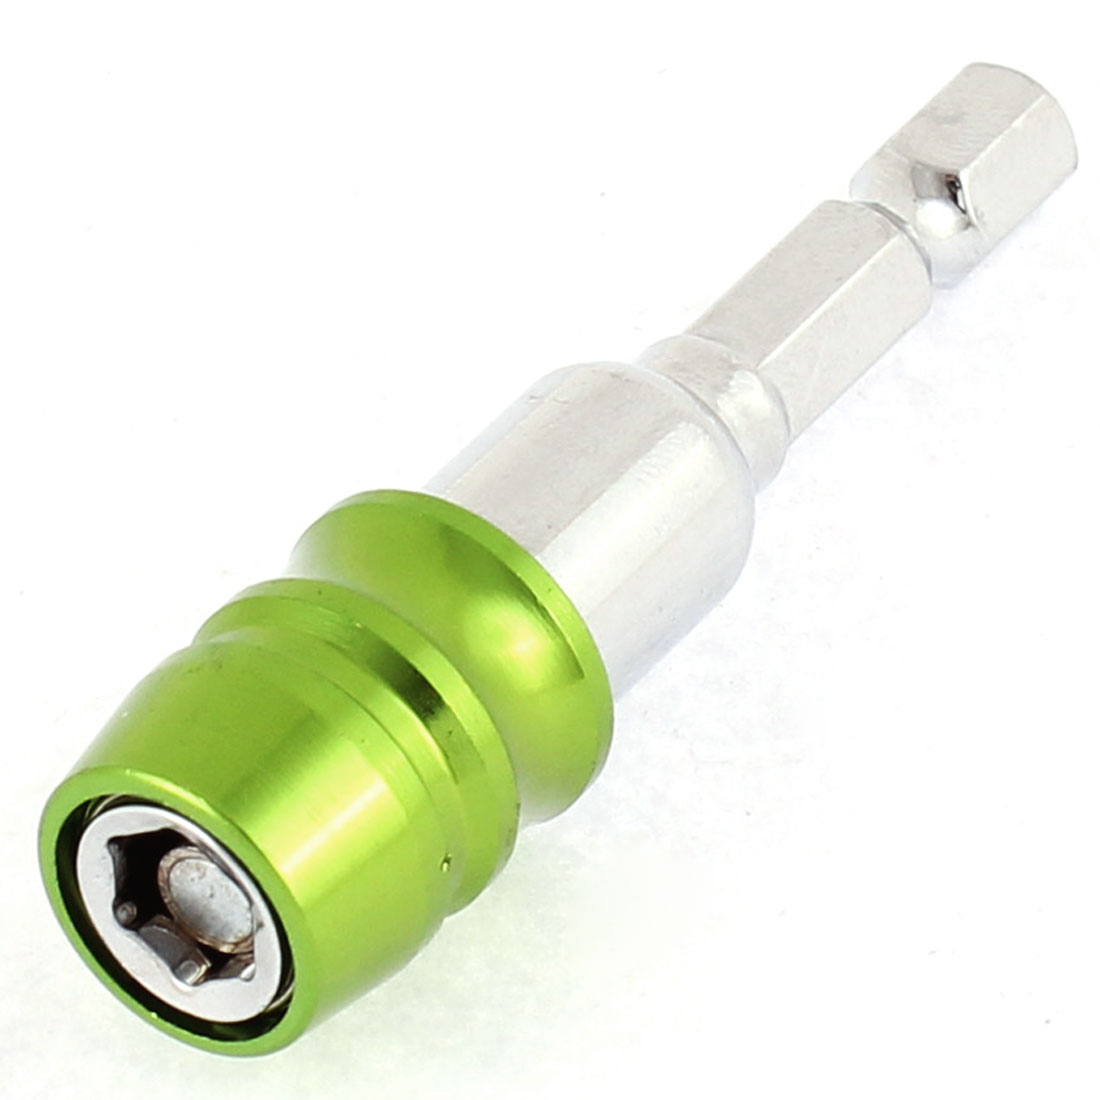 14mm x 60mm Metal Magnetic Hex Socket Nut Driver Bit Green